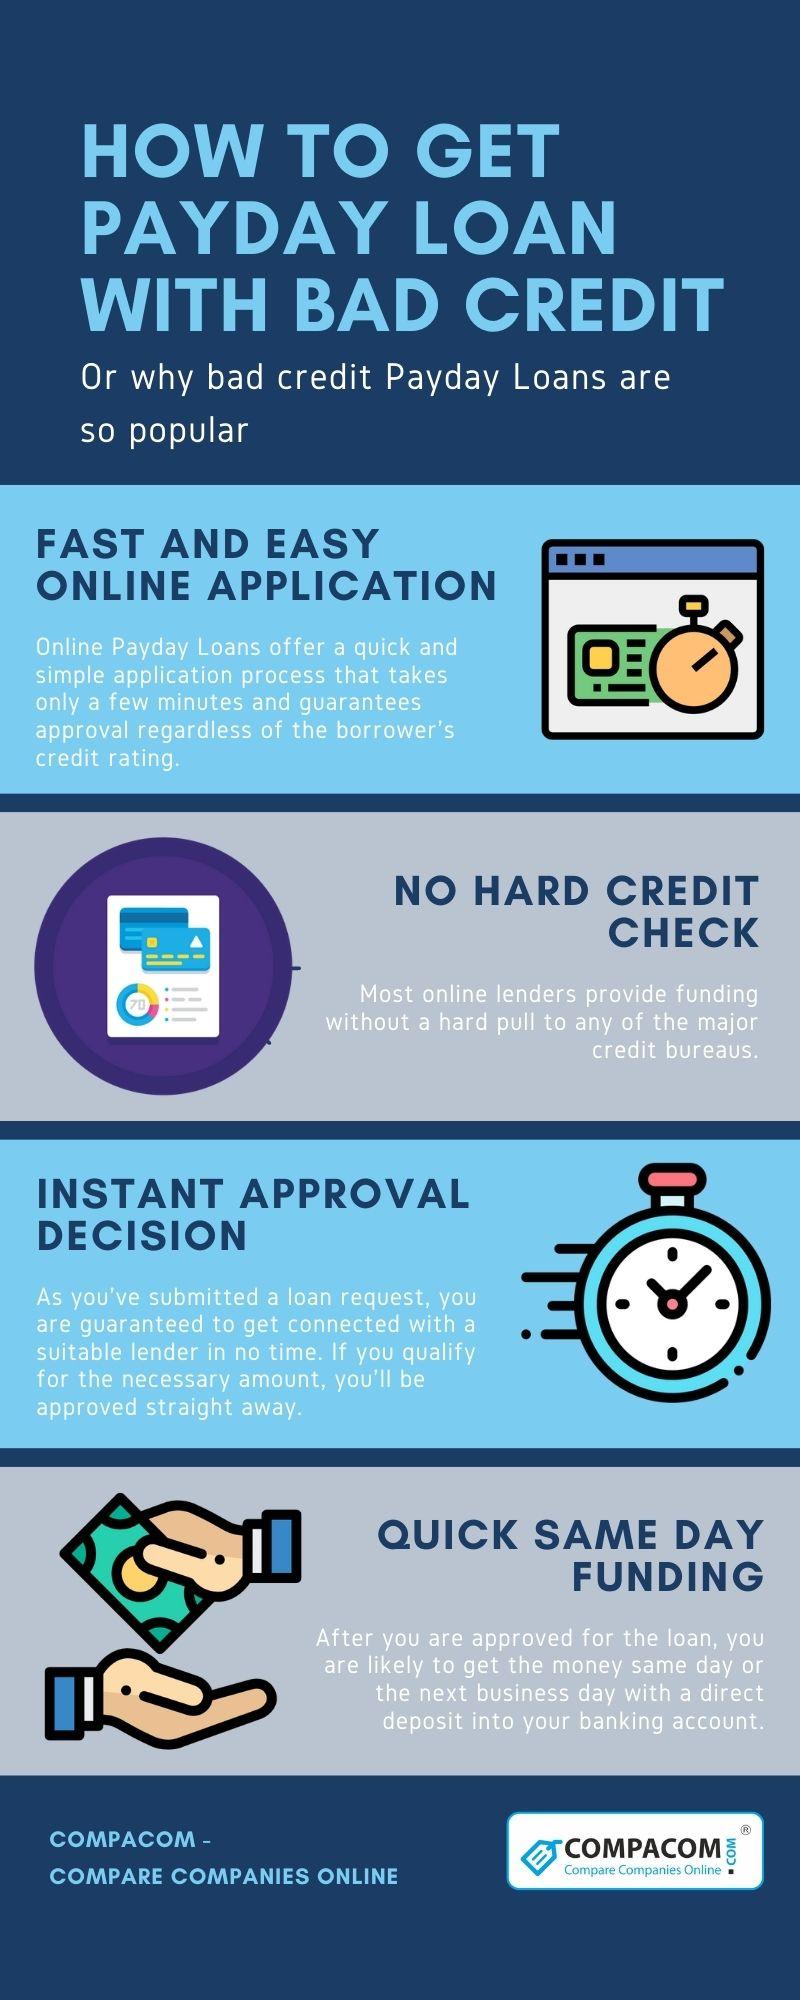 Online Payday Loans for Bad Credit September 10 COMPACOM